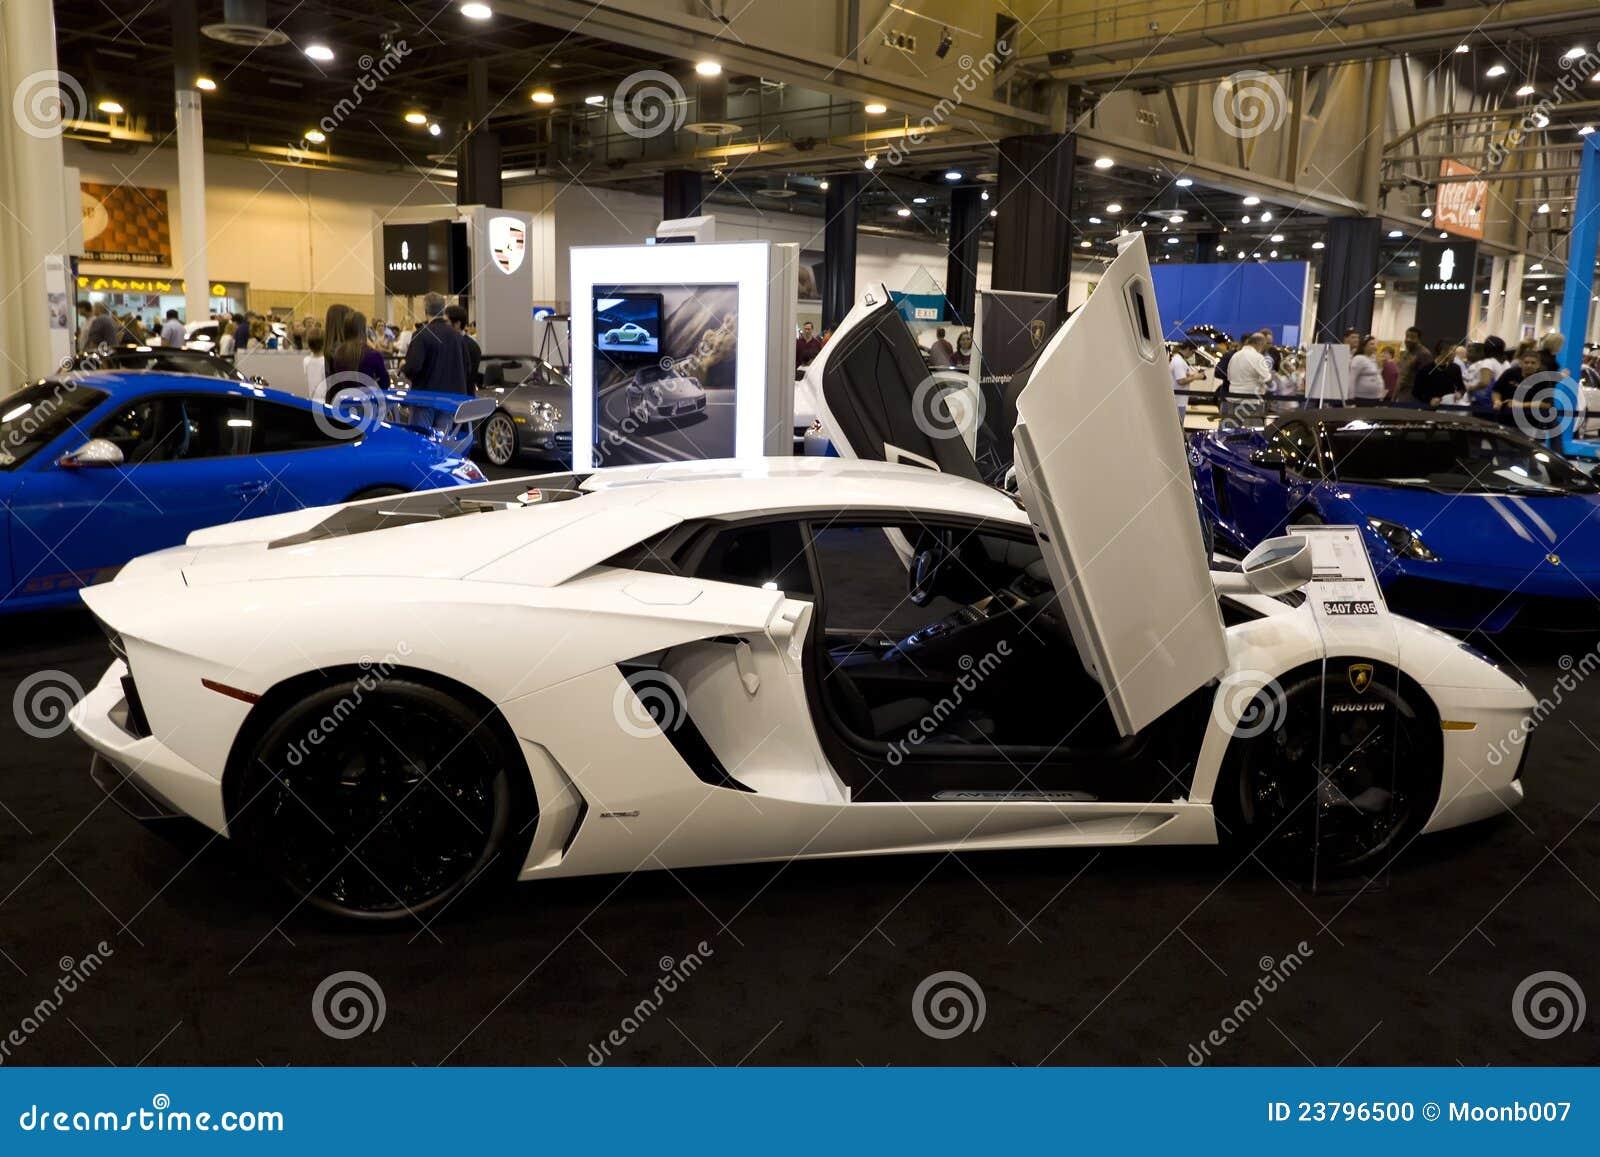 Lamborghini Aventador Editorial Image Image Of Showroom 23796500